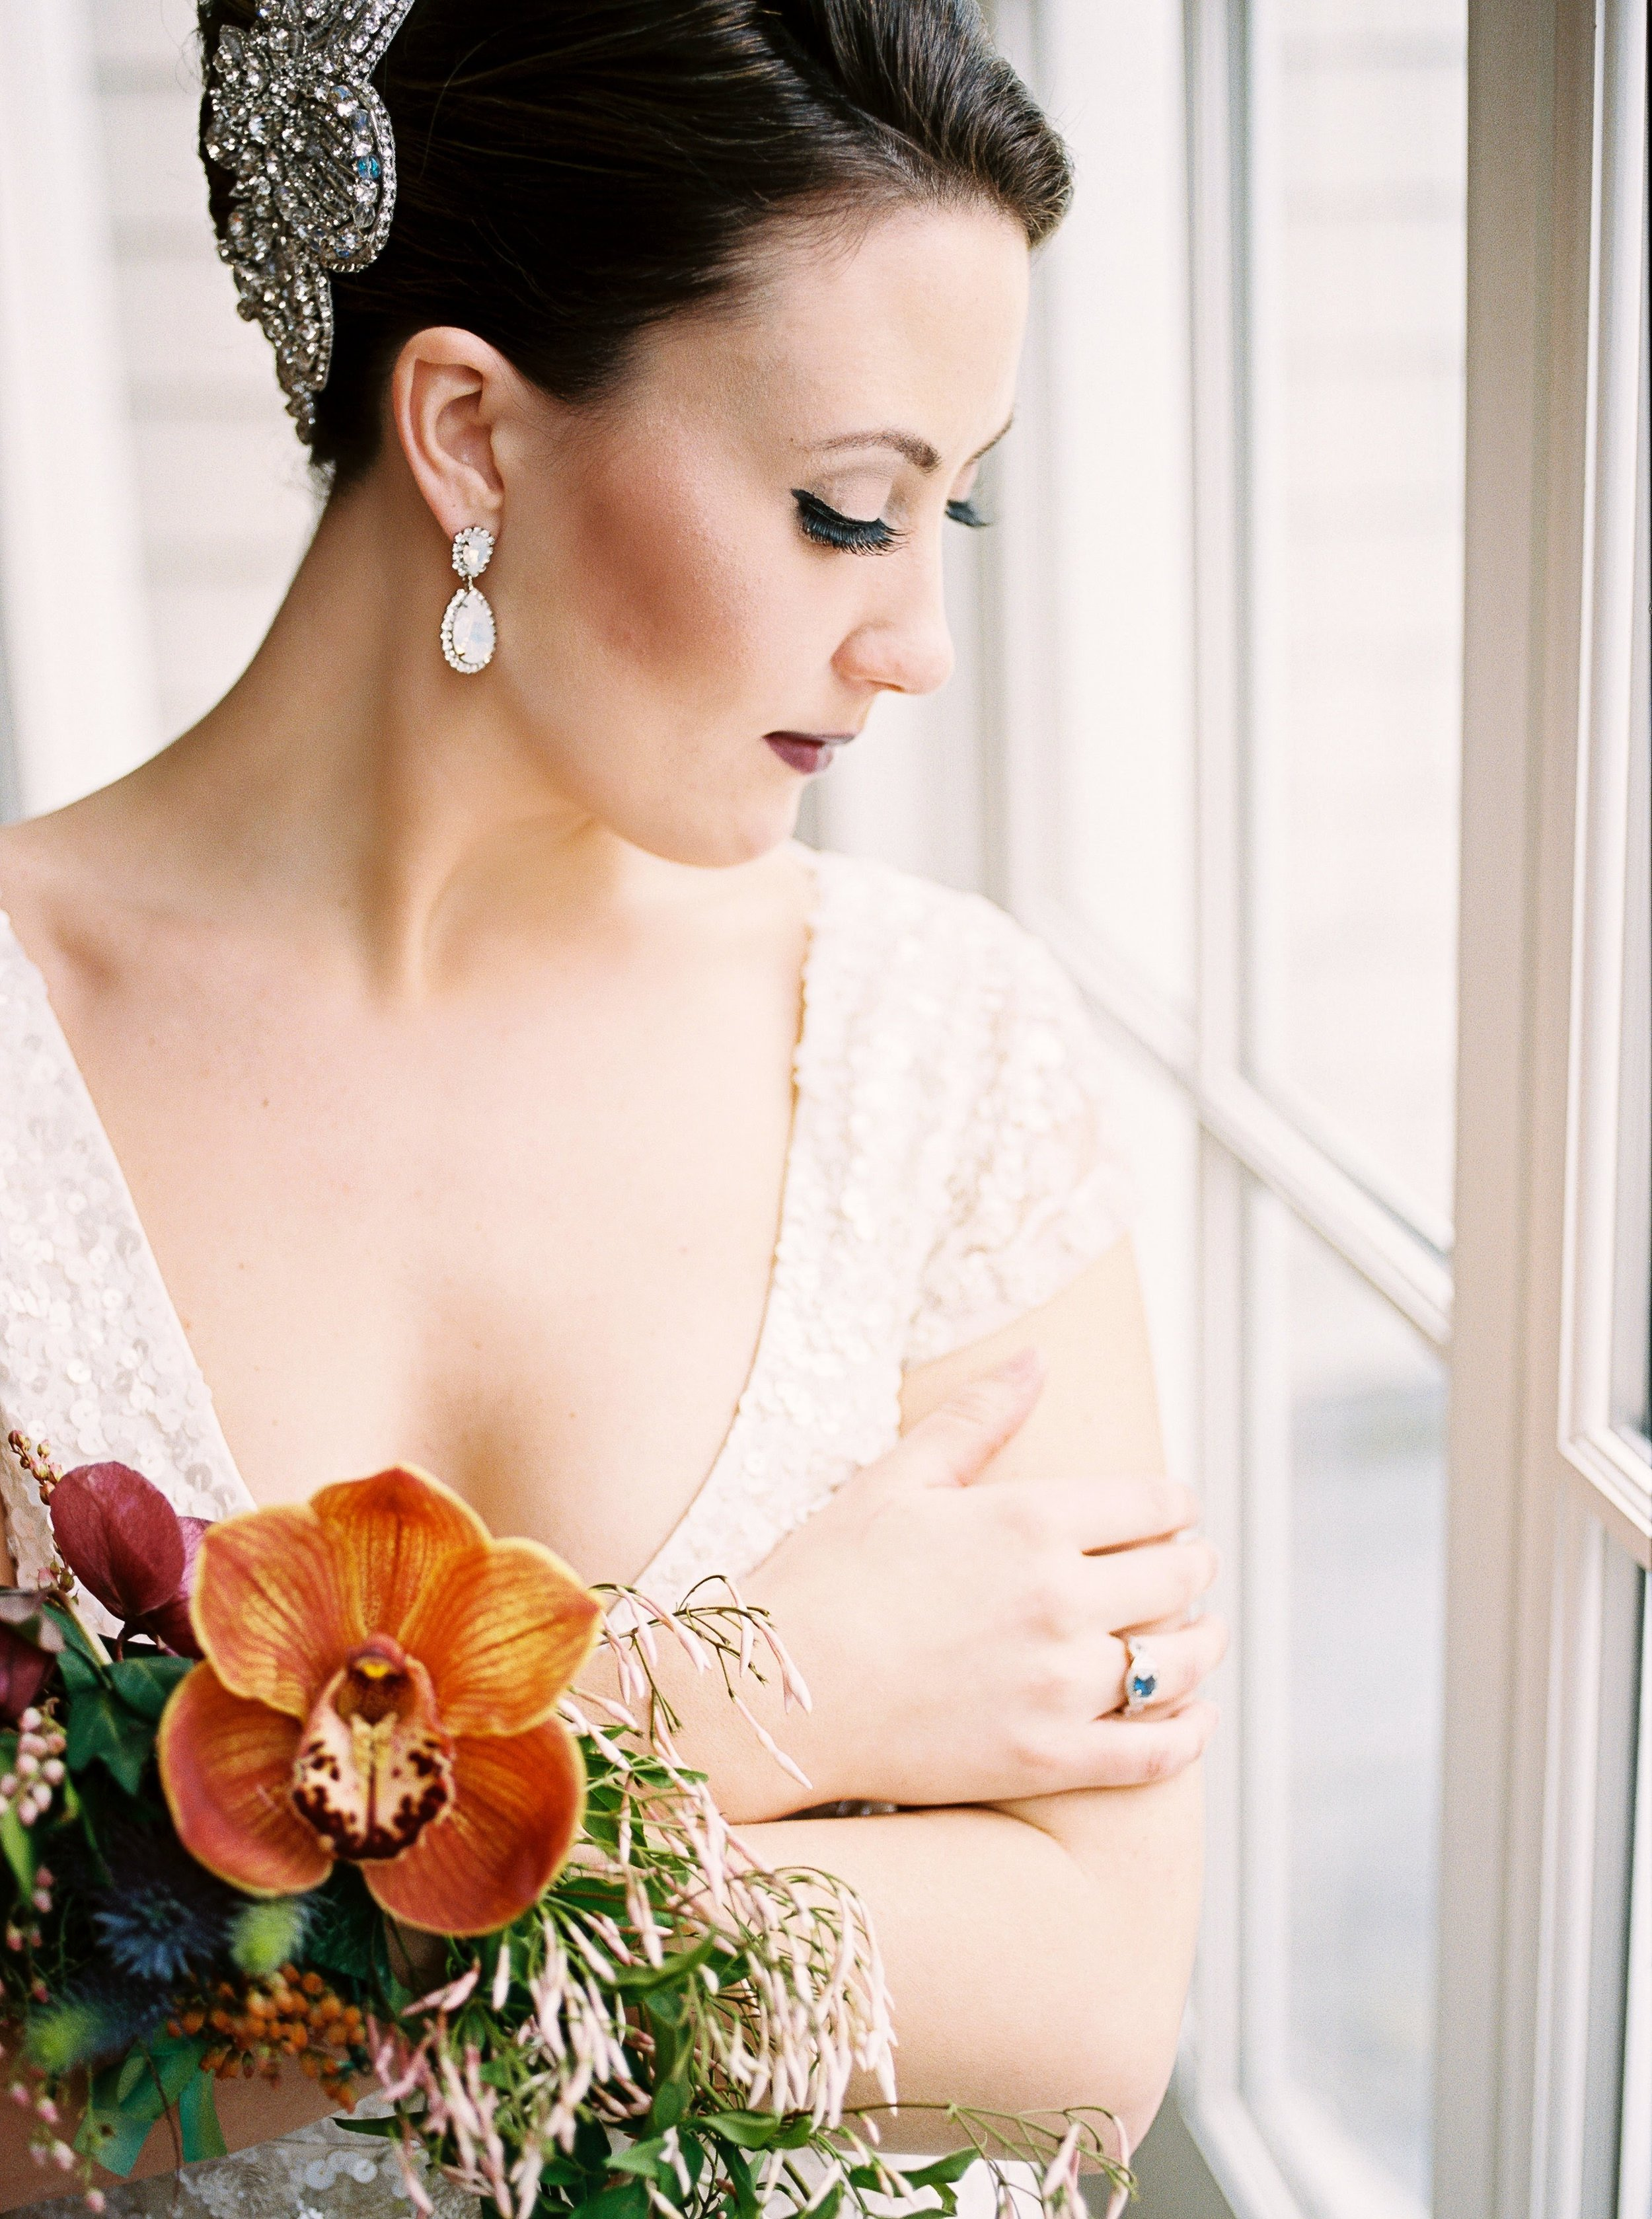 Alexandra-Elise-Photography-Ali-Reed-Rowland-House-Styled-Shoot-102.jpg